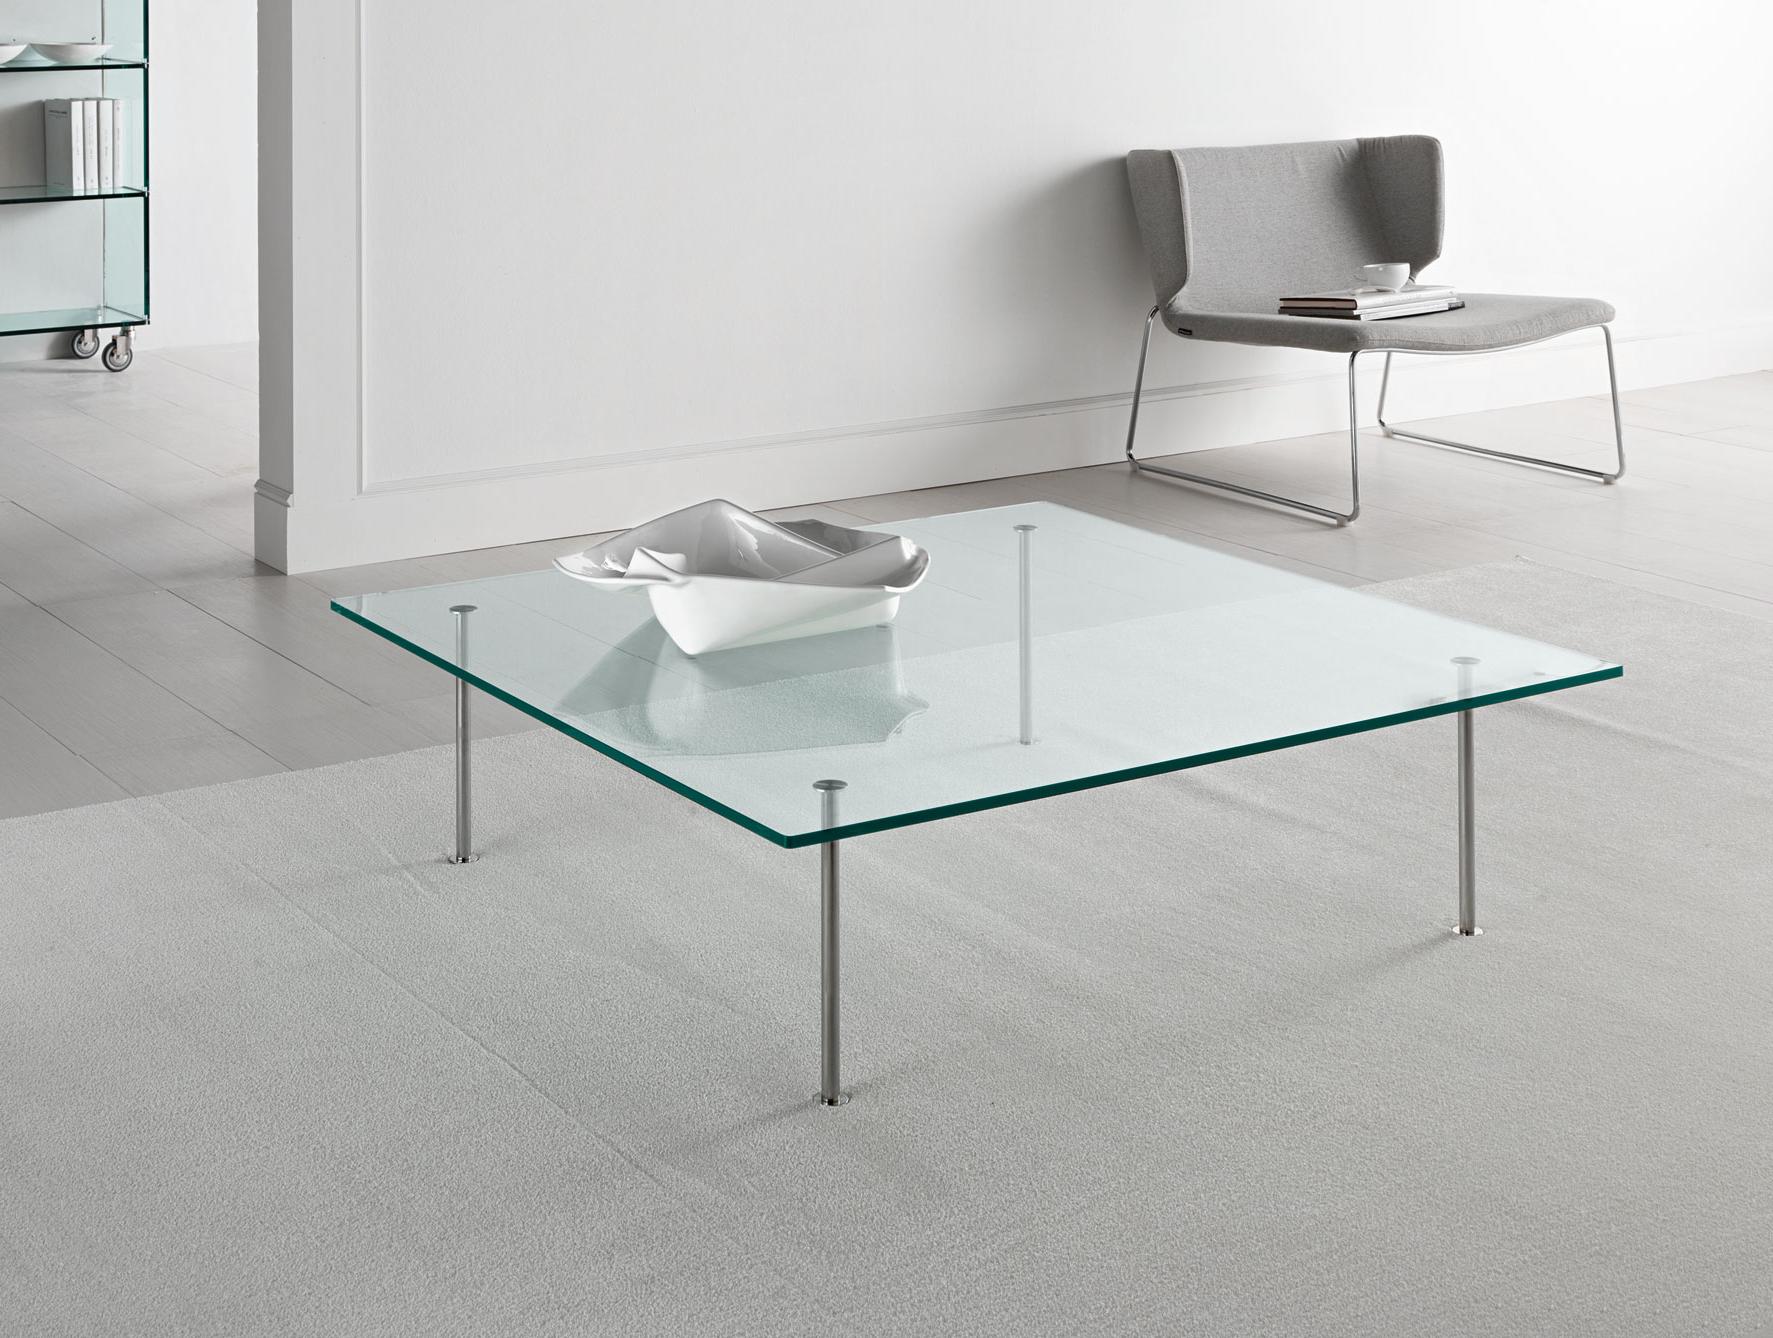 Modular Coffee Tables For Well Liked Nella Vetrina Tonelli Twig Modular Italian Square Coffee Table (View 13 of 20)